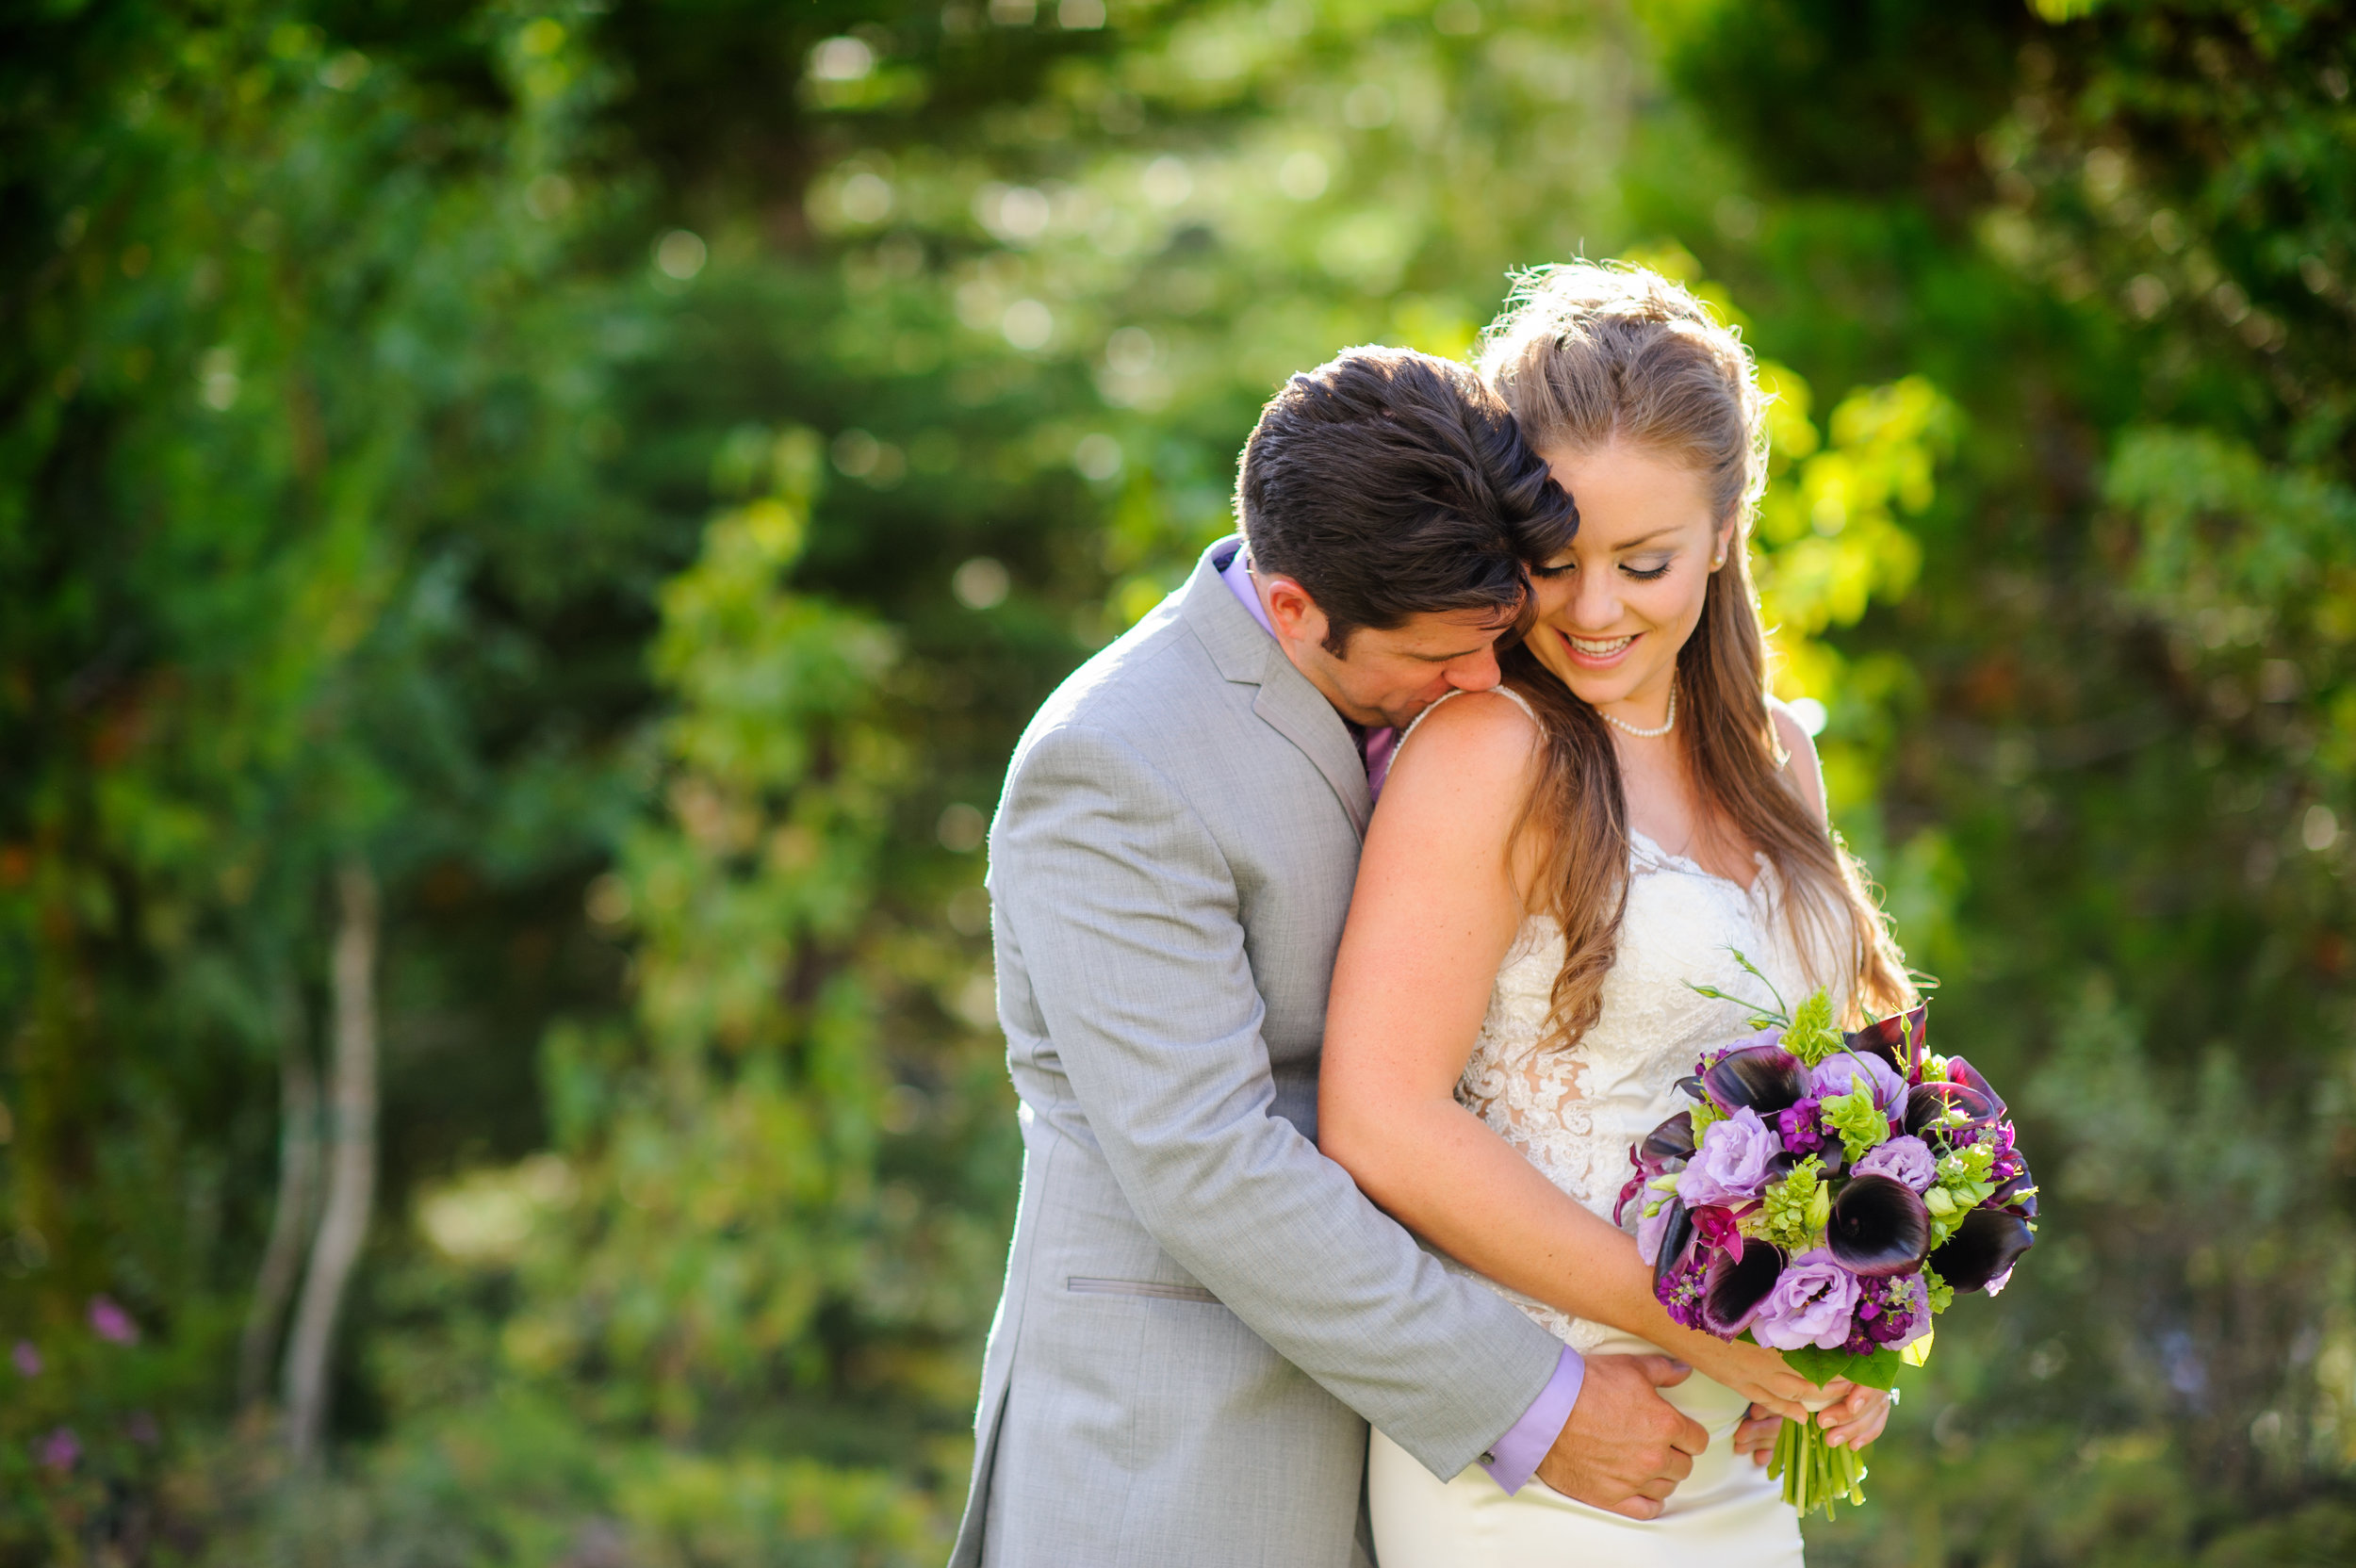 becca-jacob-024-tenaya-lodge-yosemite-wedding-photographer-katherine-nicole-photography.JPG